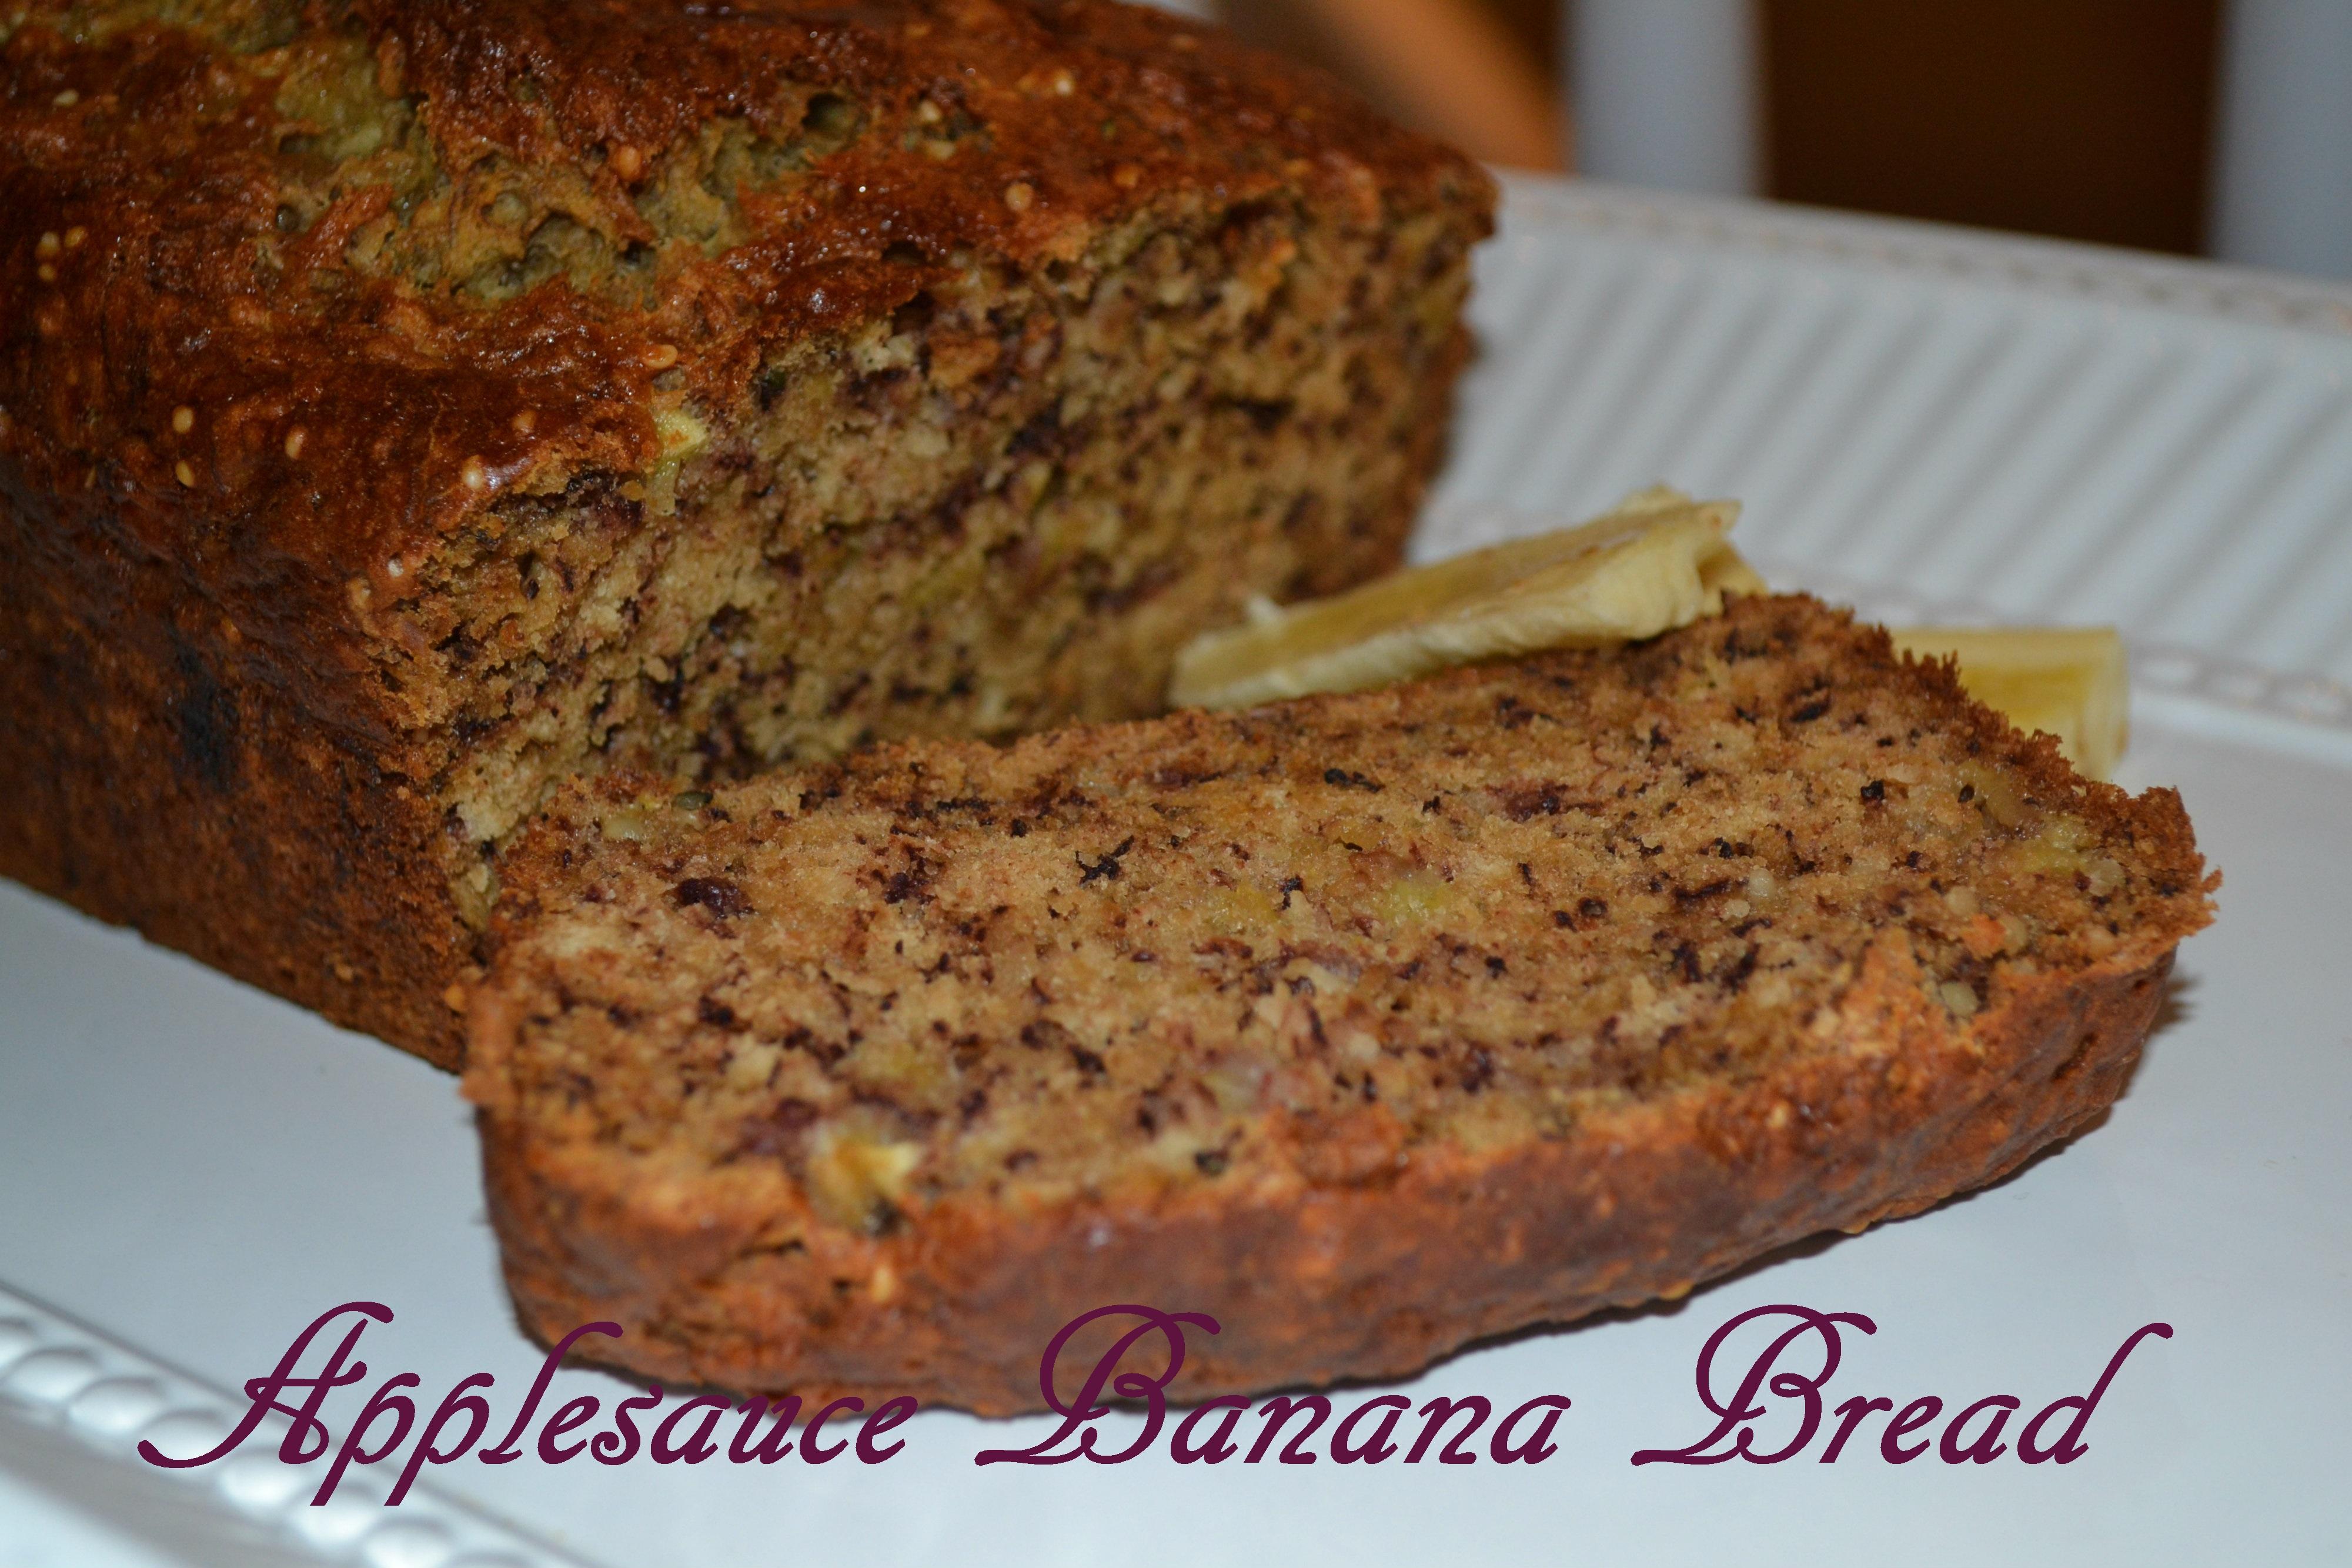 Applesauce Banana Bread | yummyforyourtummy♥